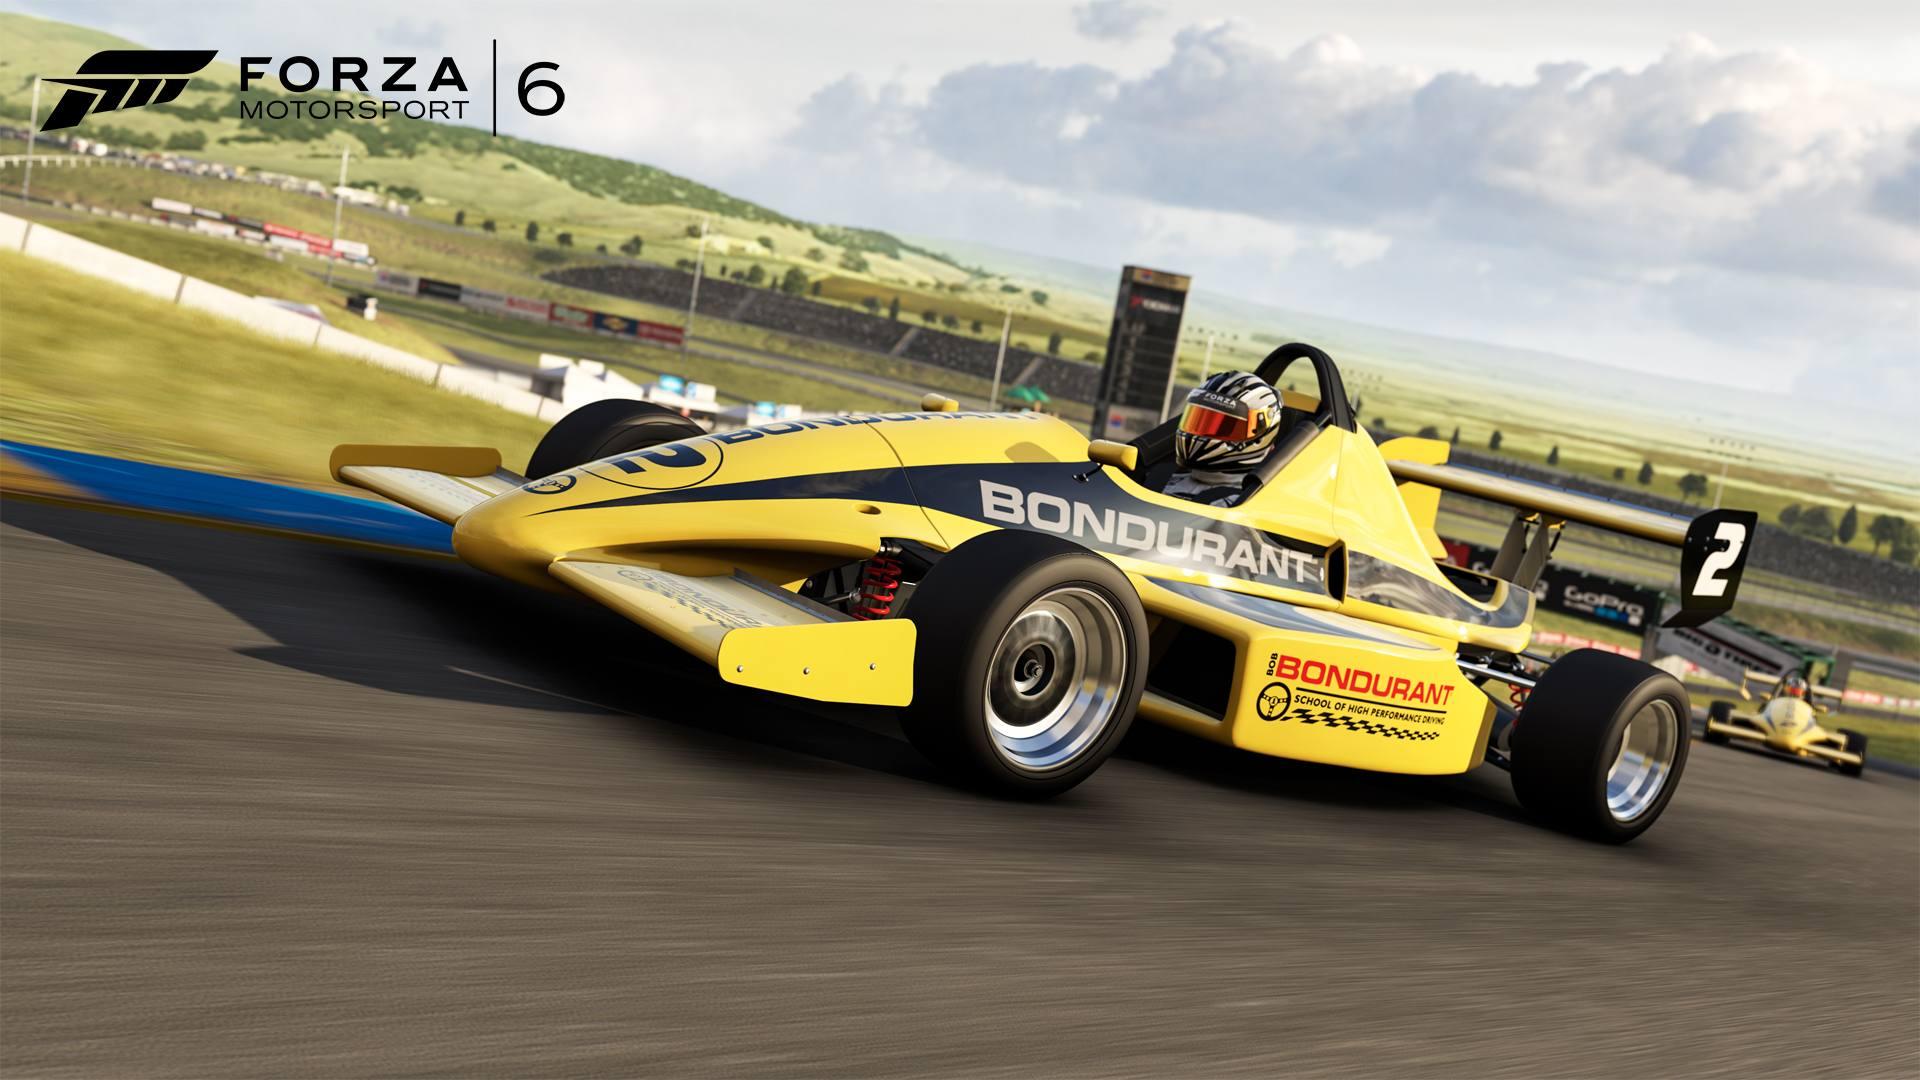 Forza Motorsport 6 05-01-16 2016 2015 Mazda Formula Mazda